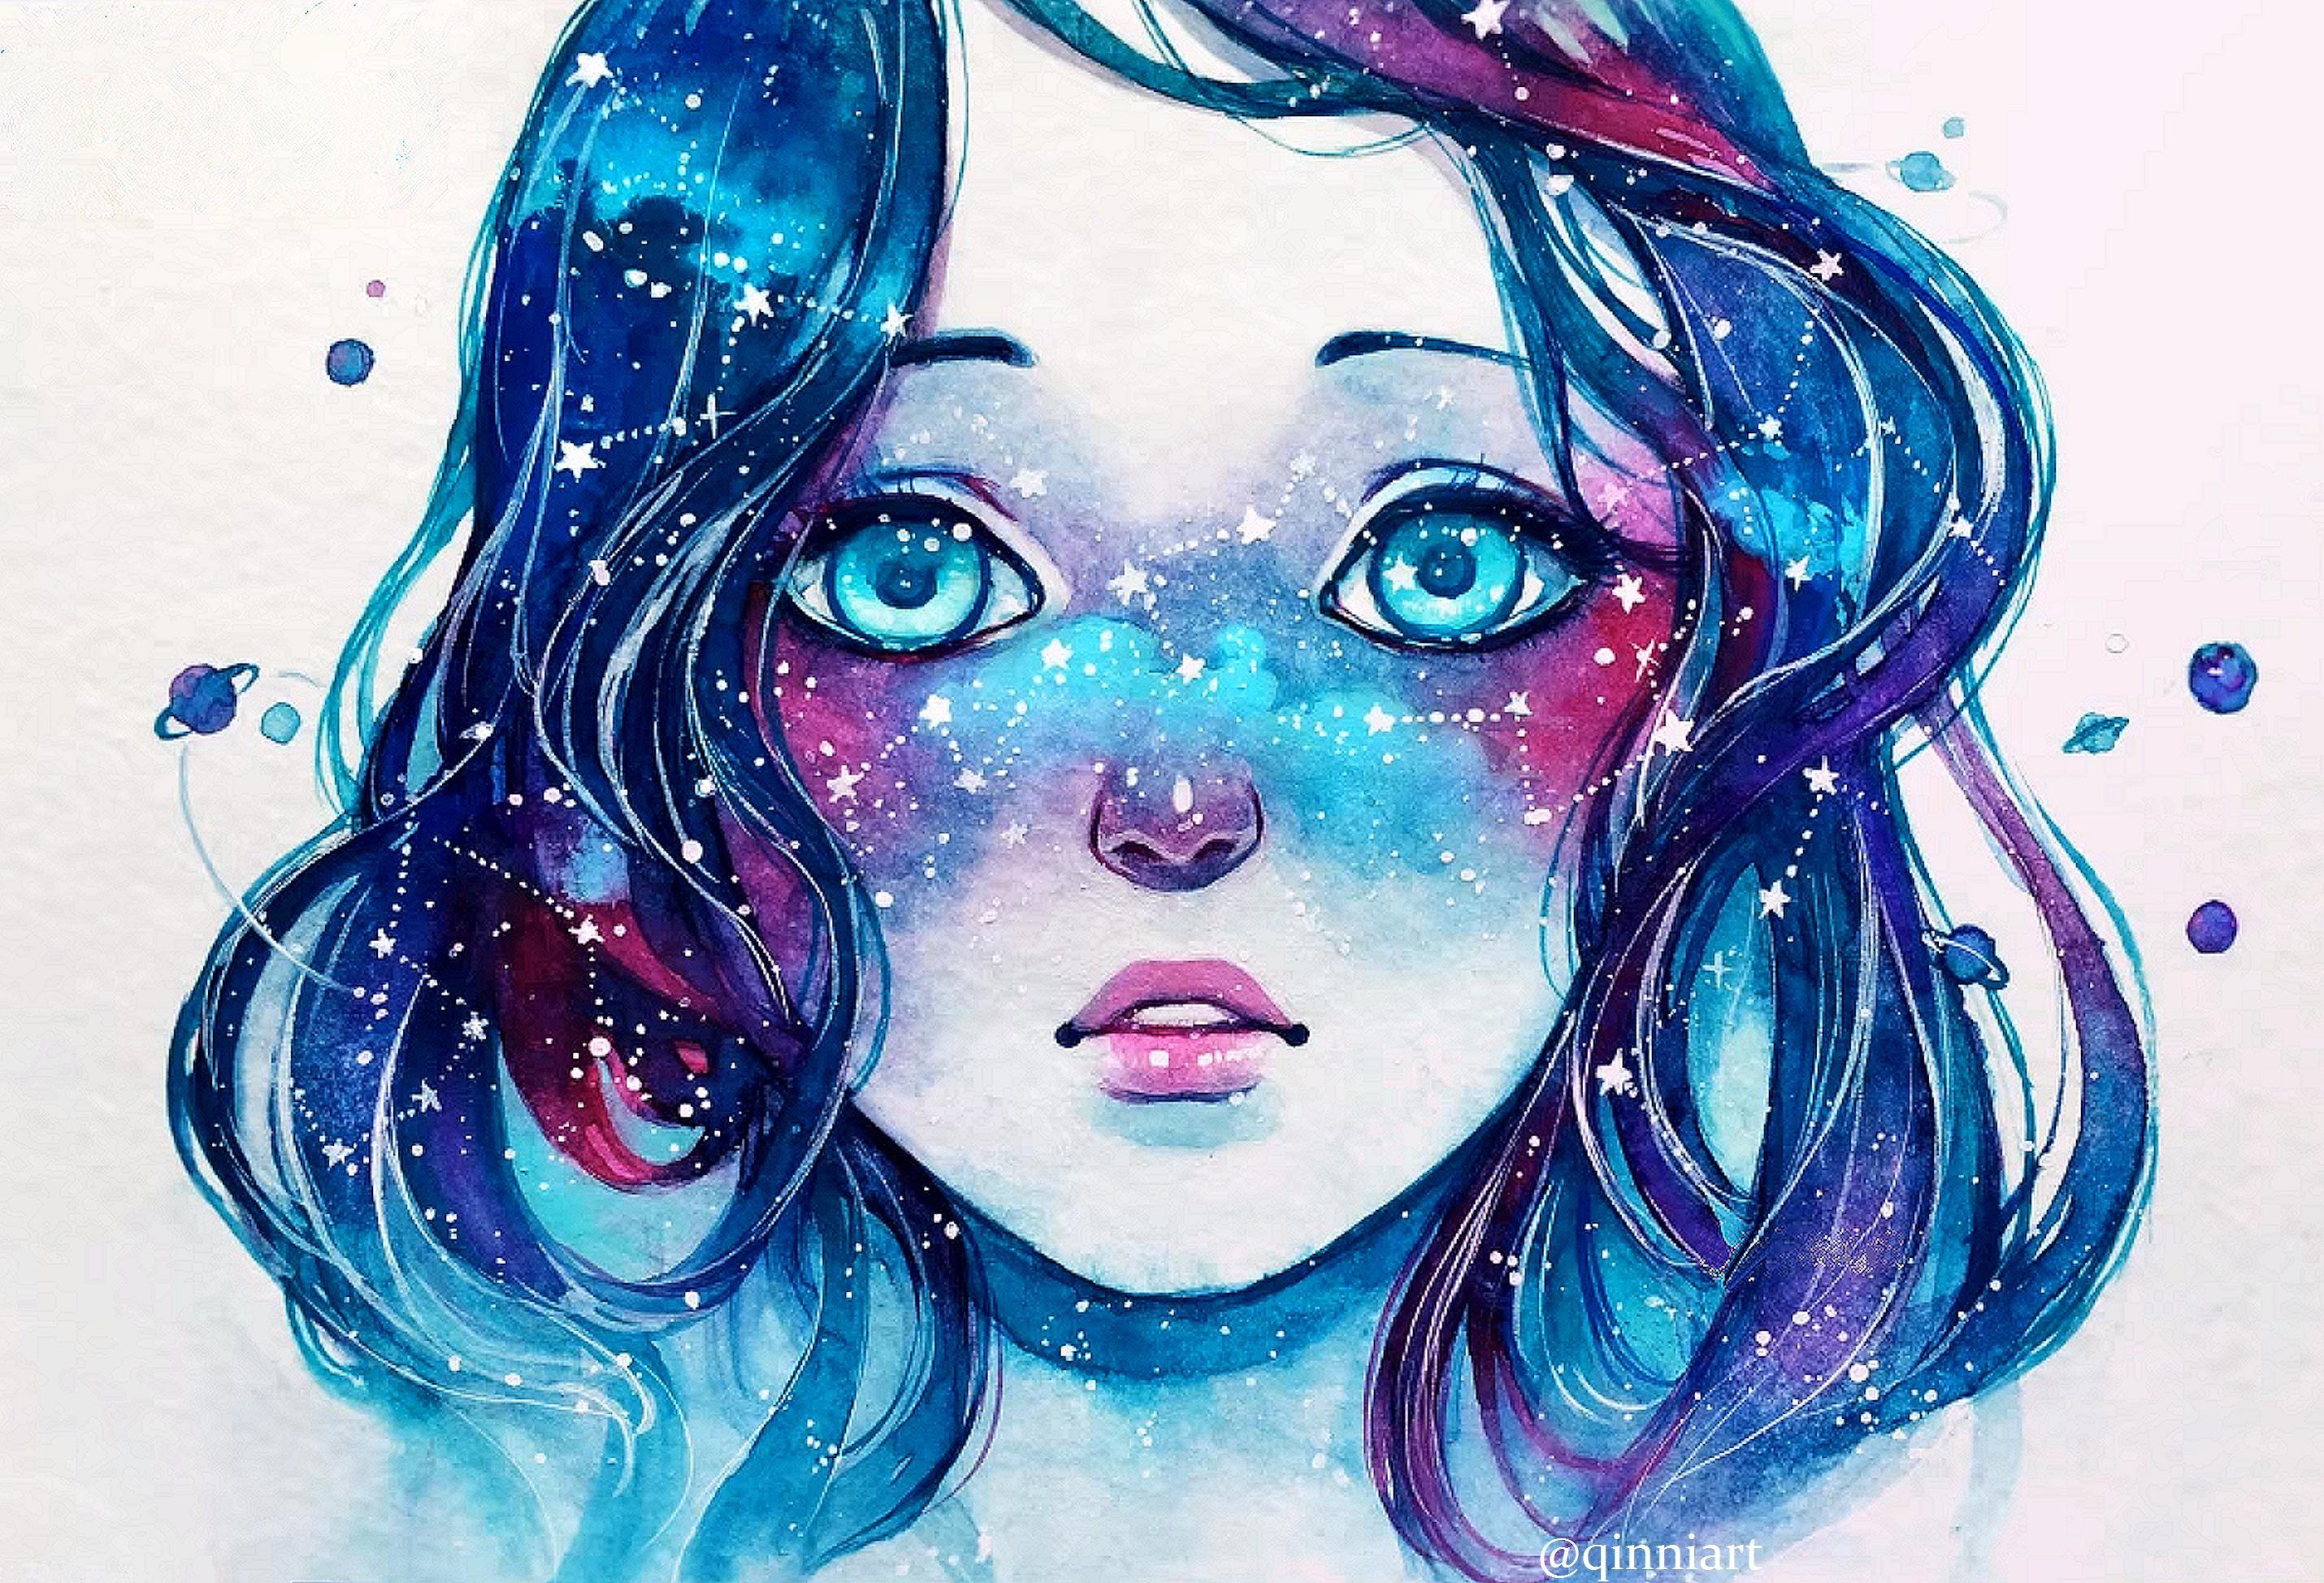 watercolor background tumblr download free beautiful